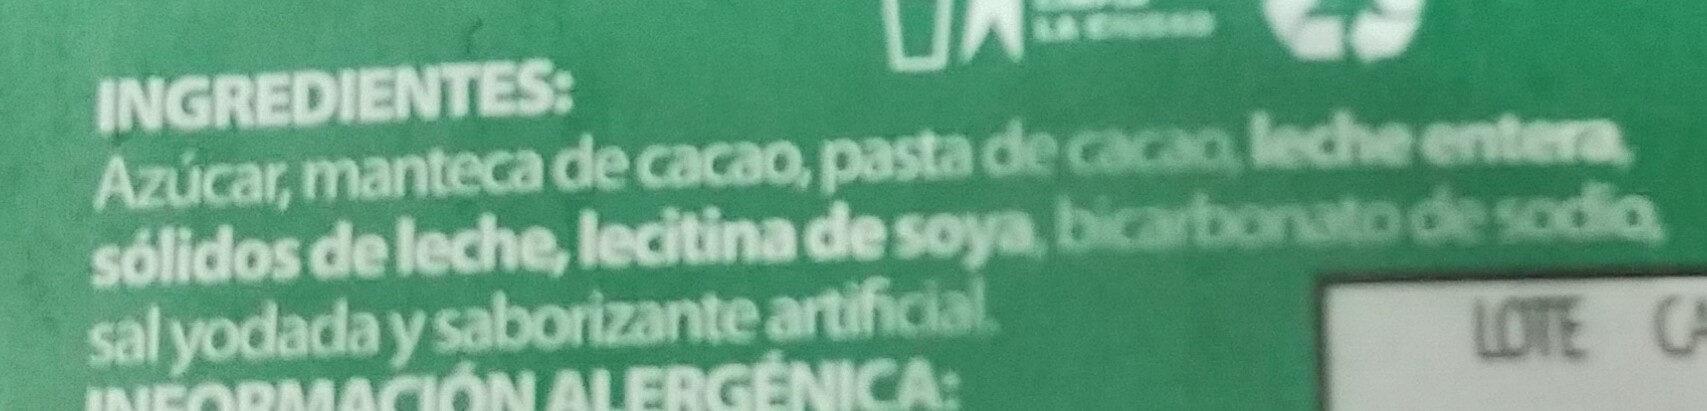 Tabikla de chocolate con leche - Ingredients